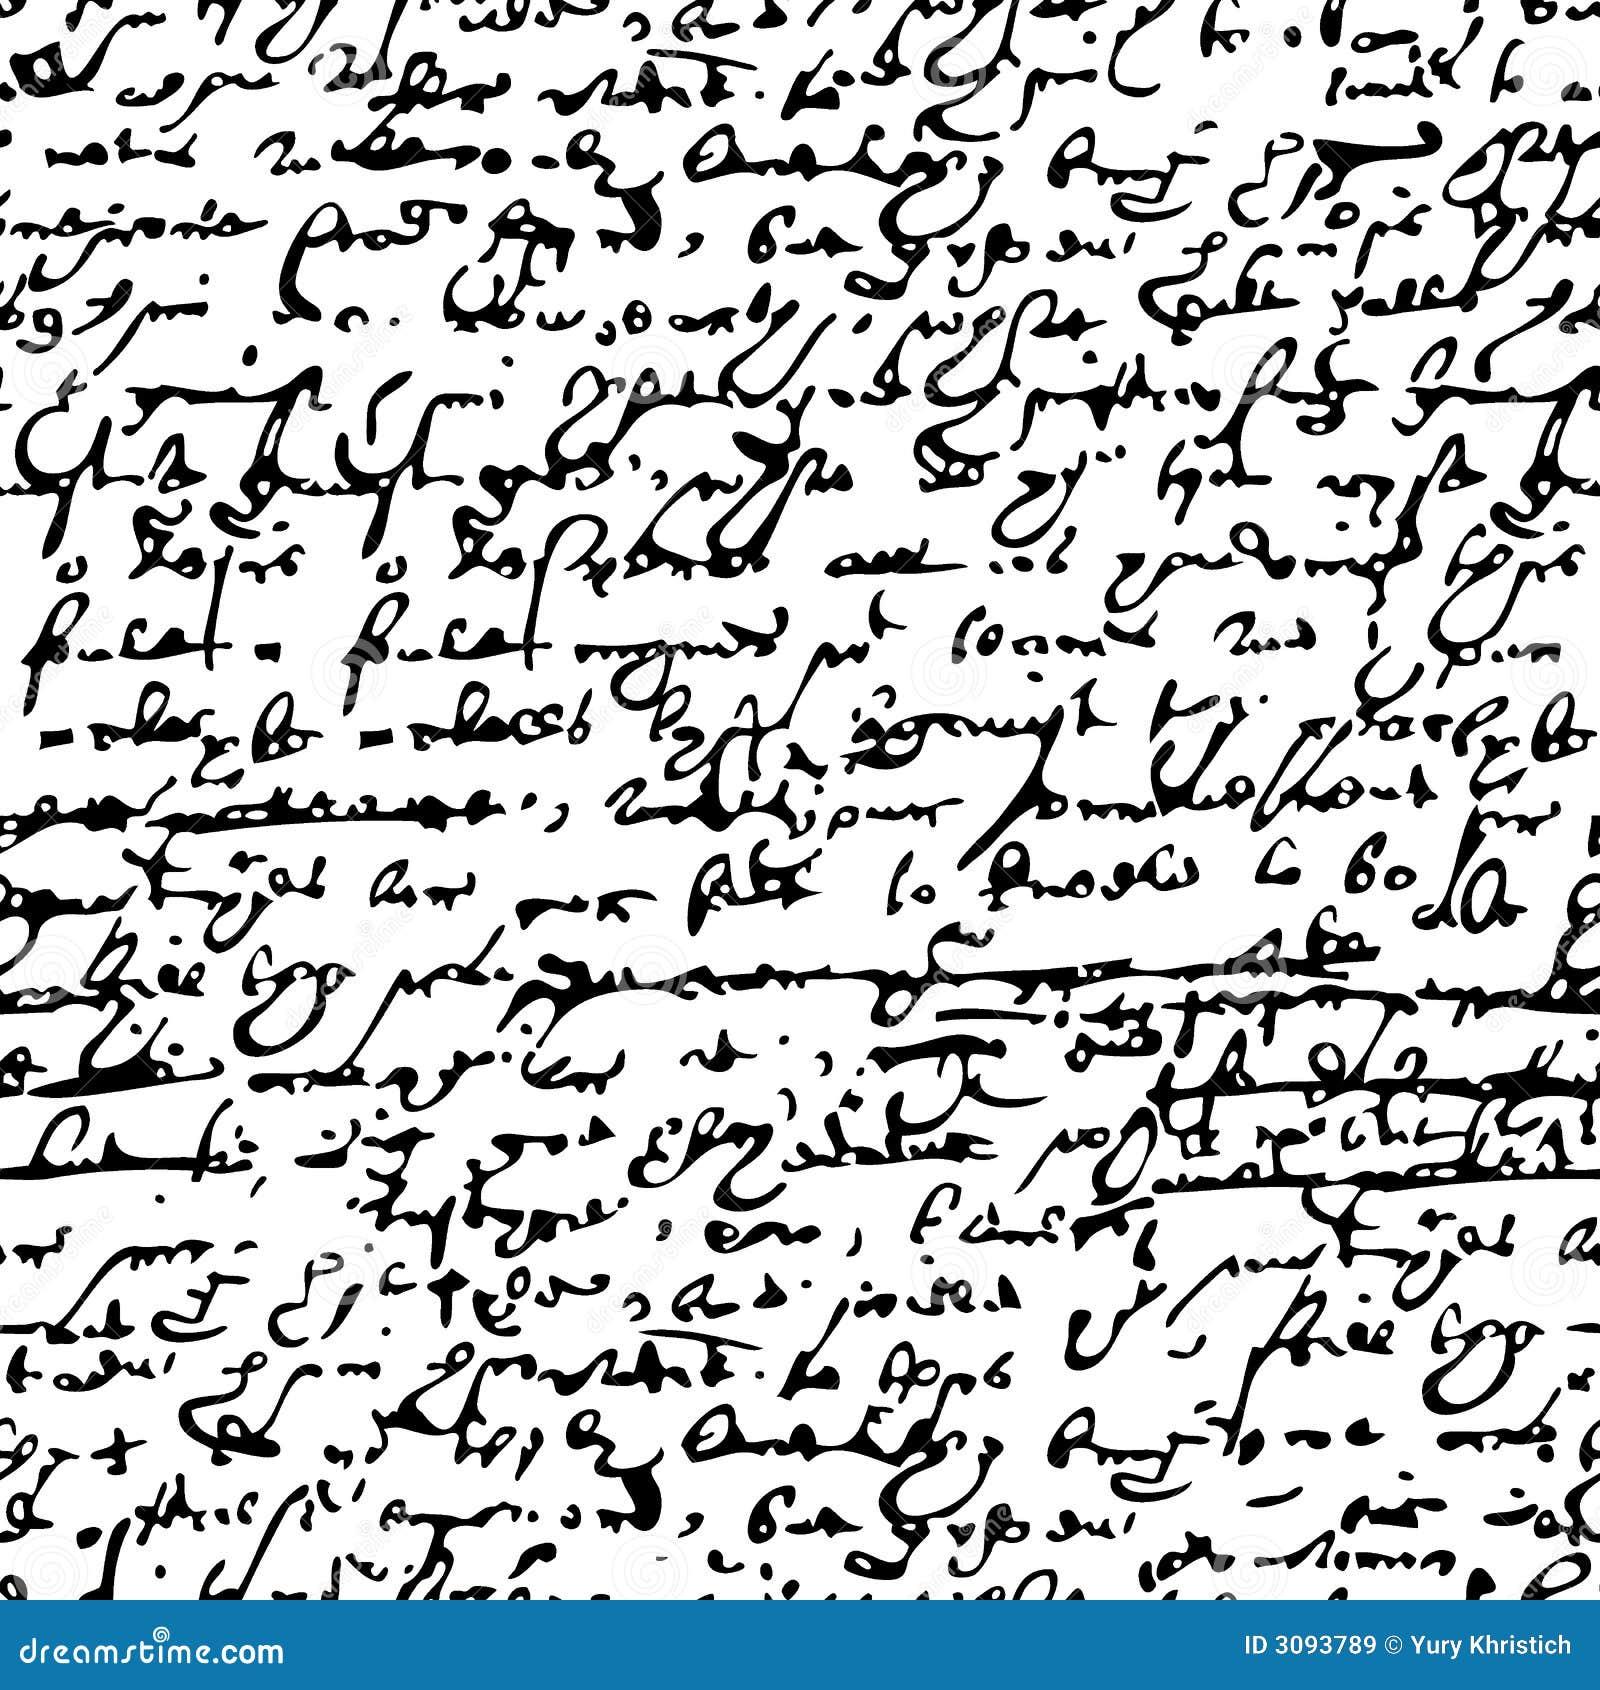 Shakespeare manuscript